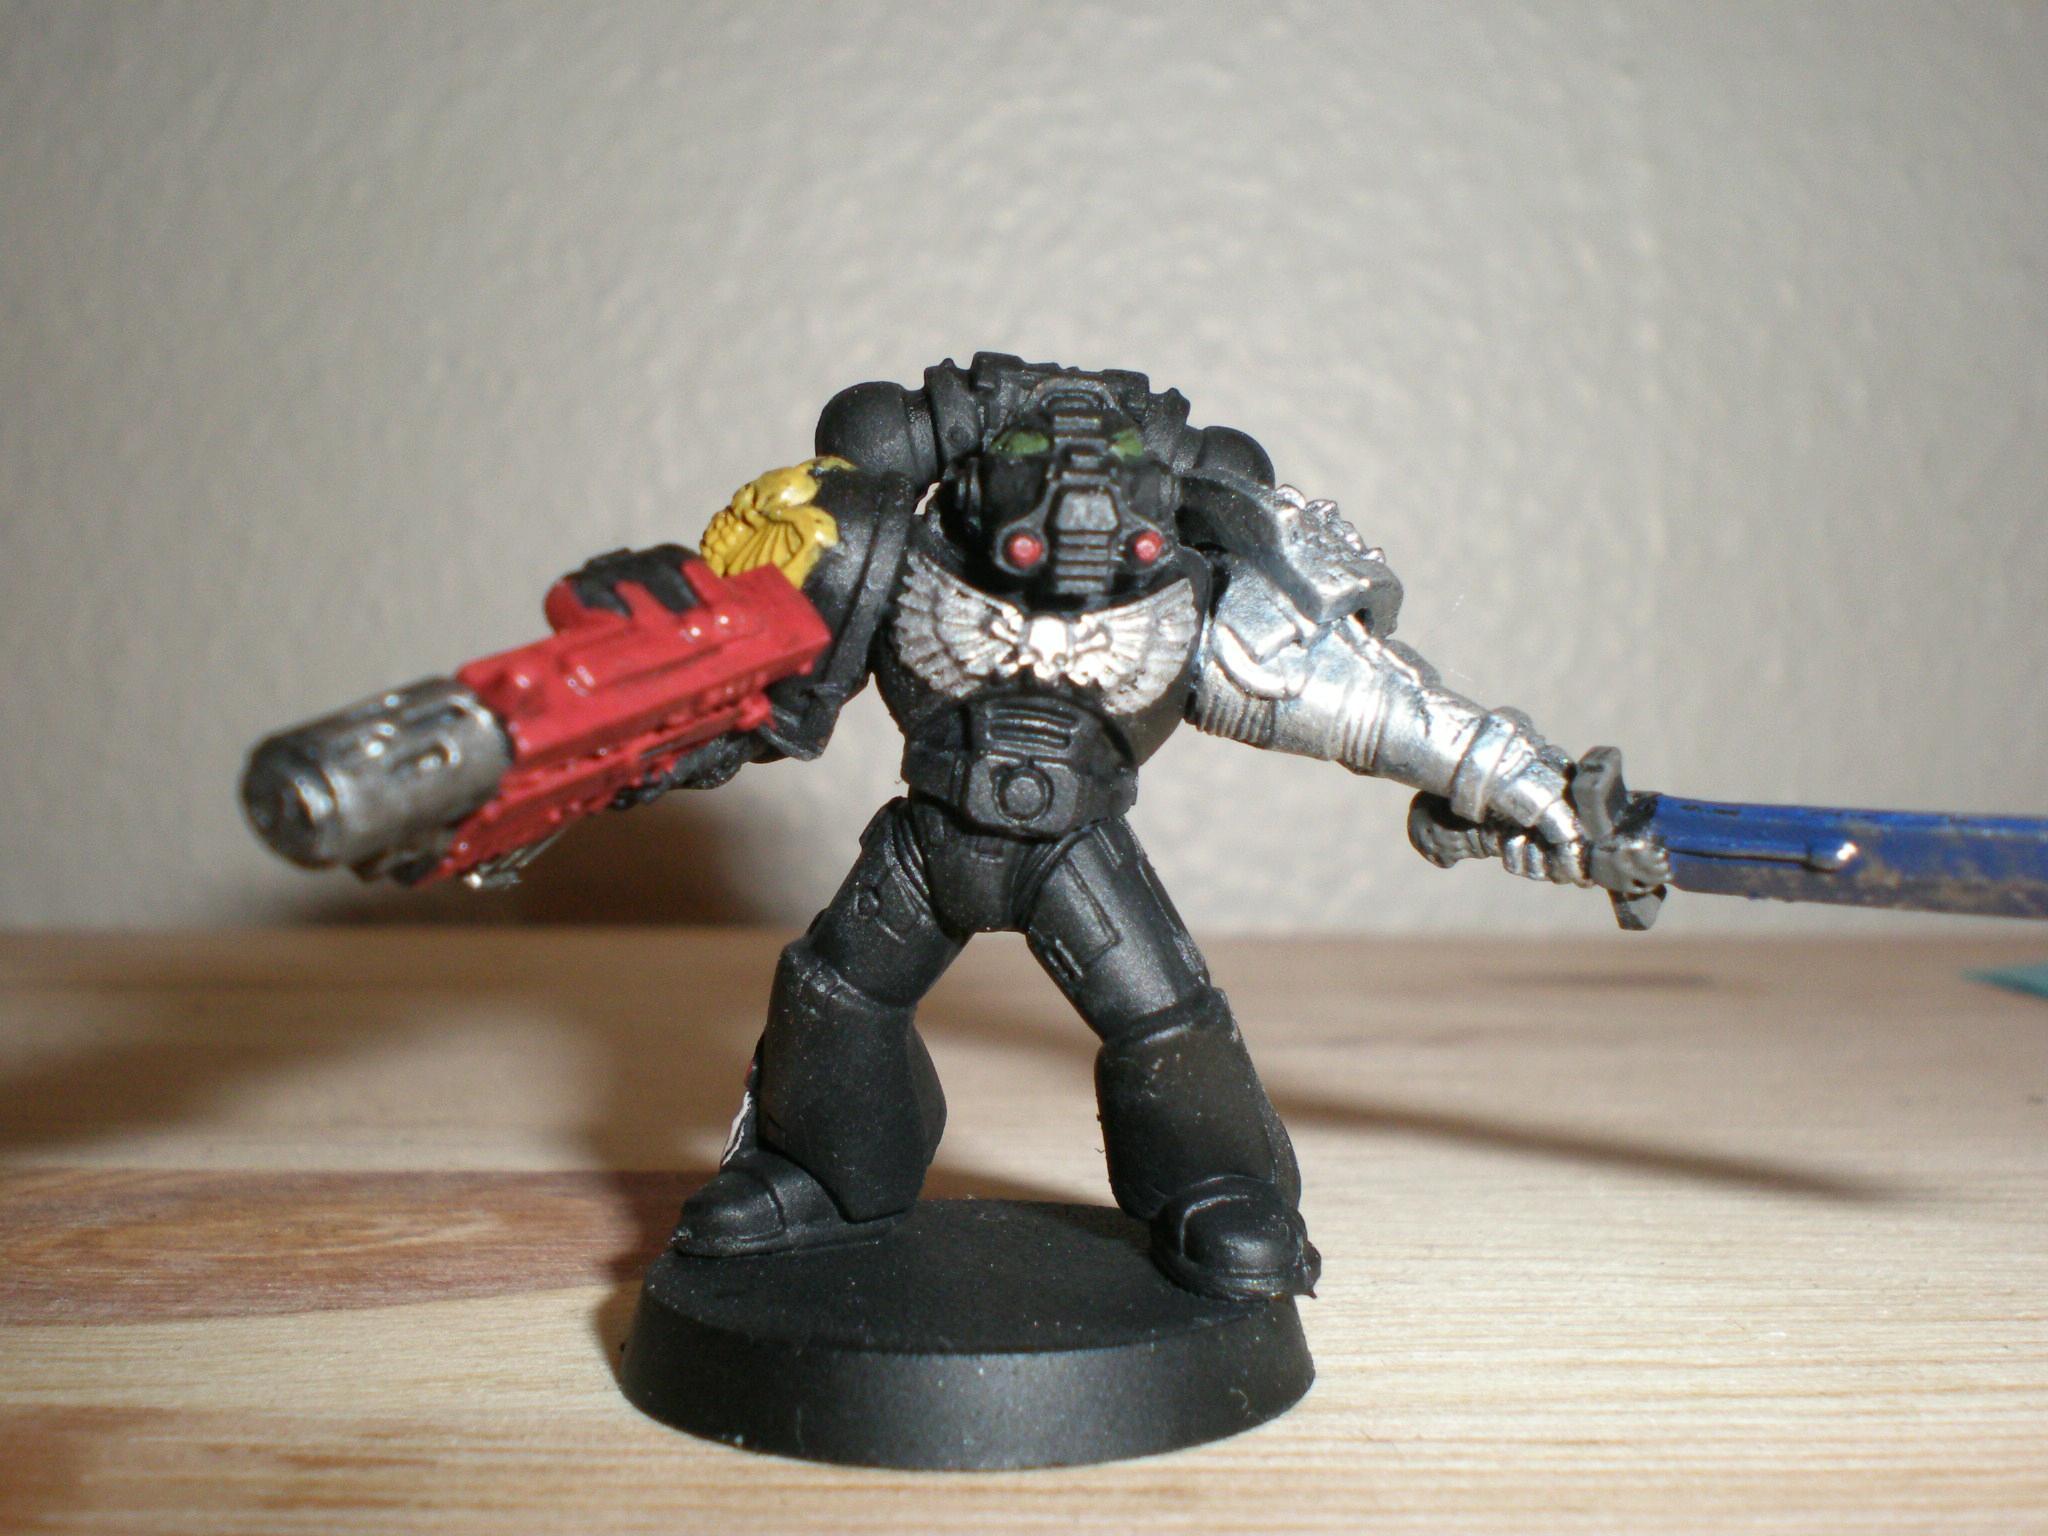 Sargeant 1 front